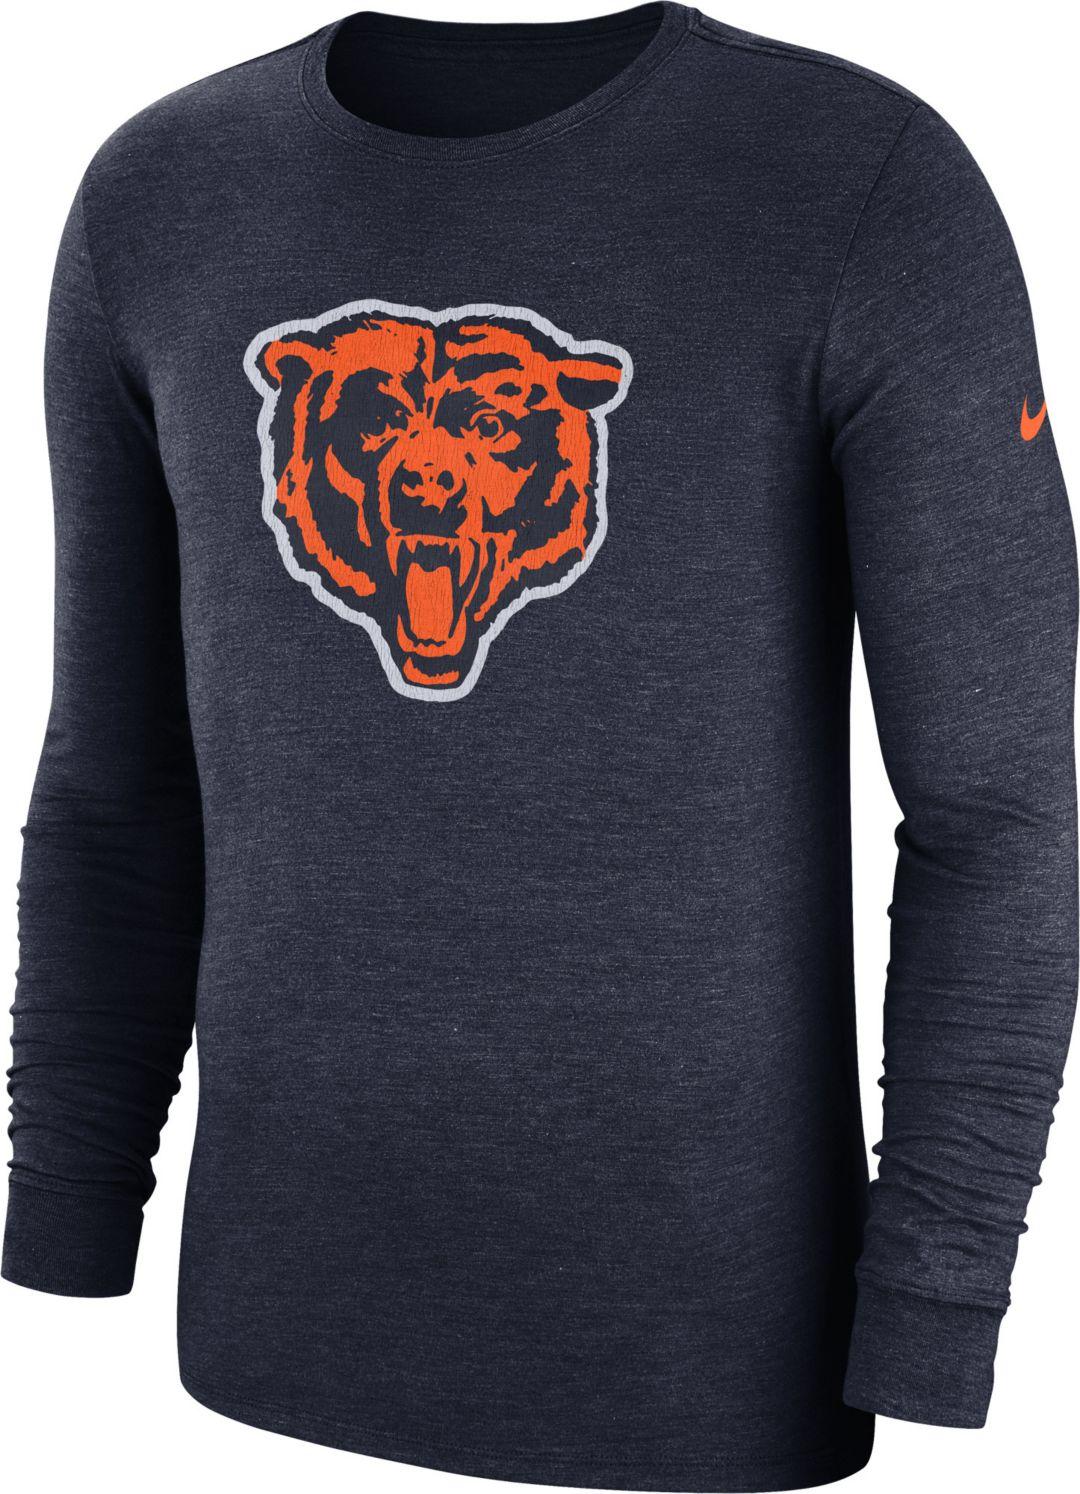 best sneakers afadd 76764 Nike Men s Chicago Bears Tri-Blend Historic Crackle Navy Long Sleeve Shirt.  noImageFound. Previous